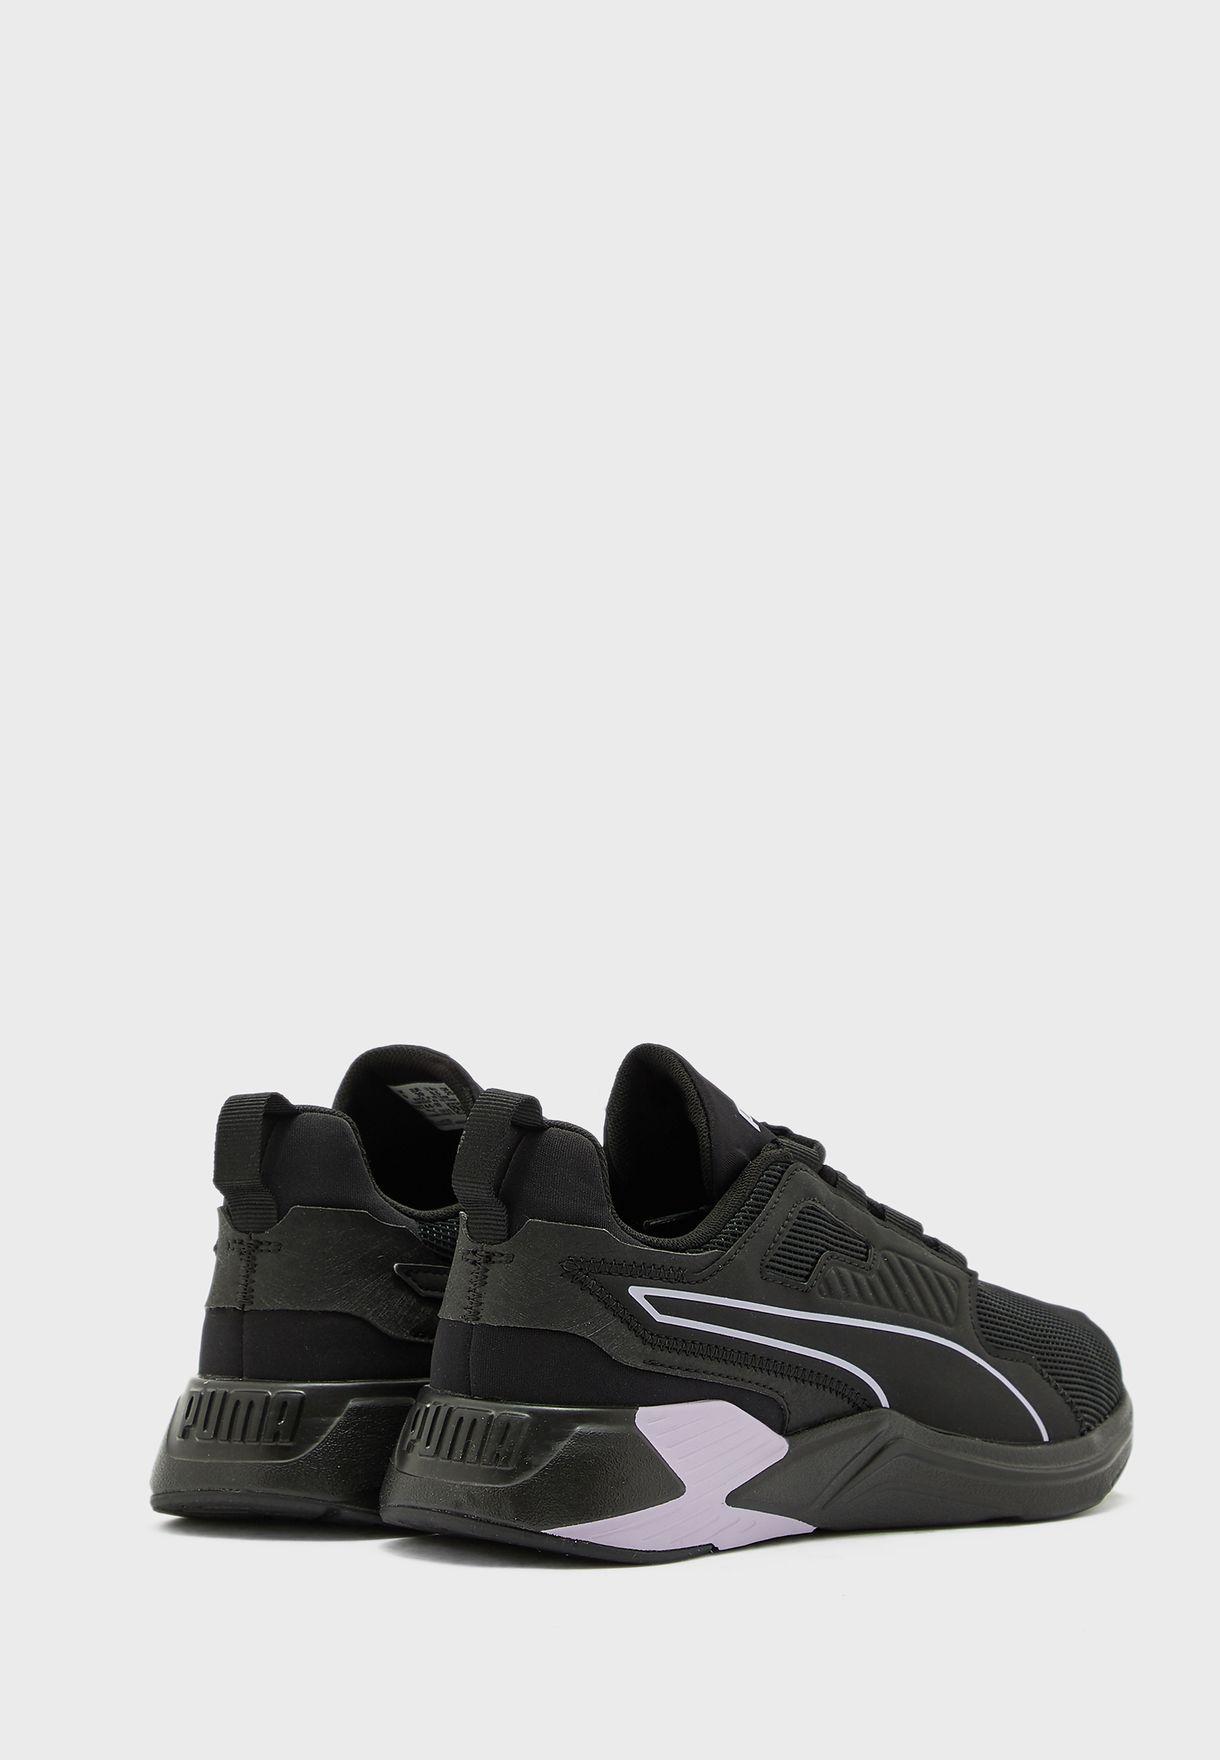 Disperse XT women shoes